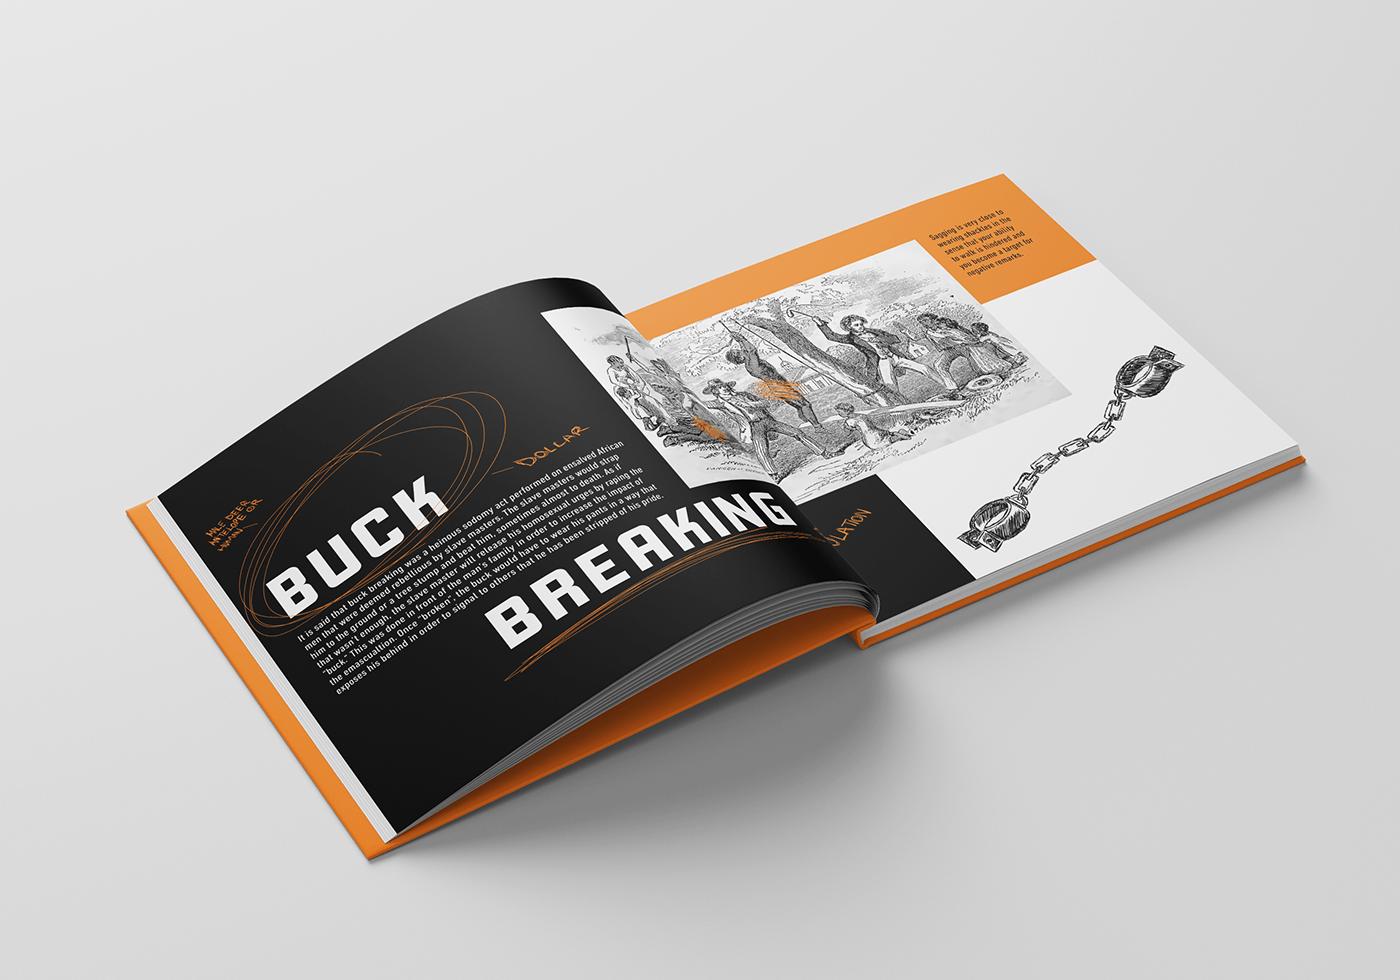 book design environmental design posters